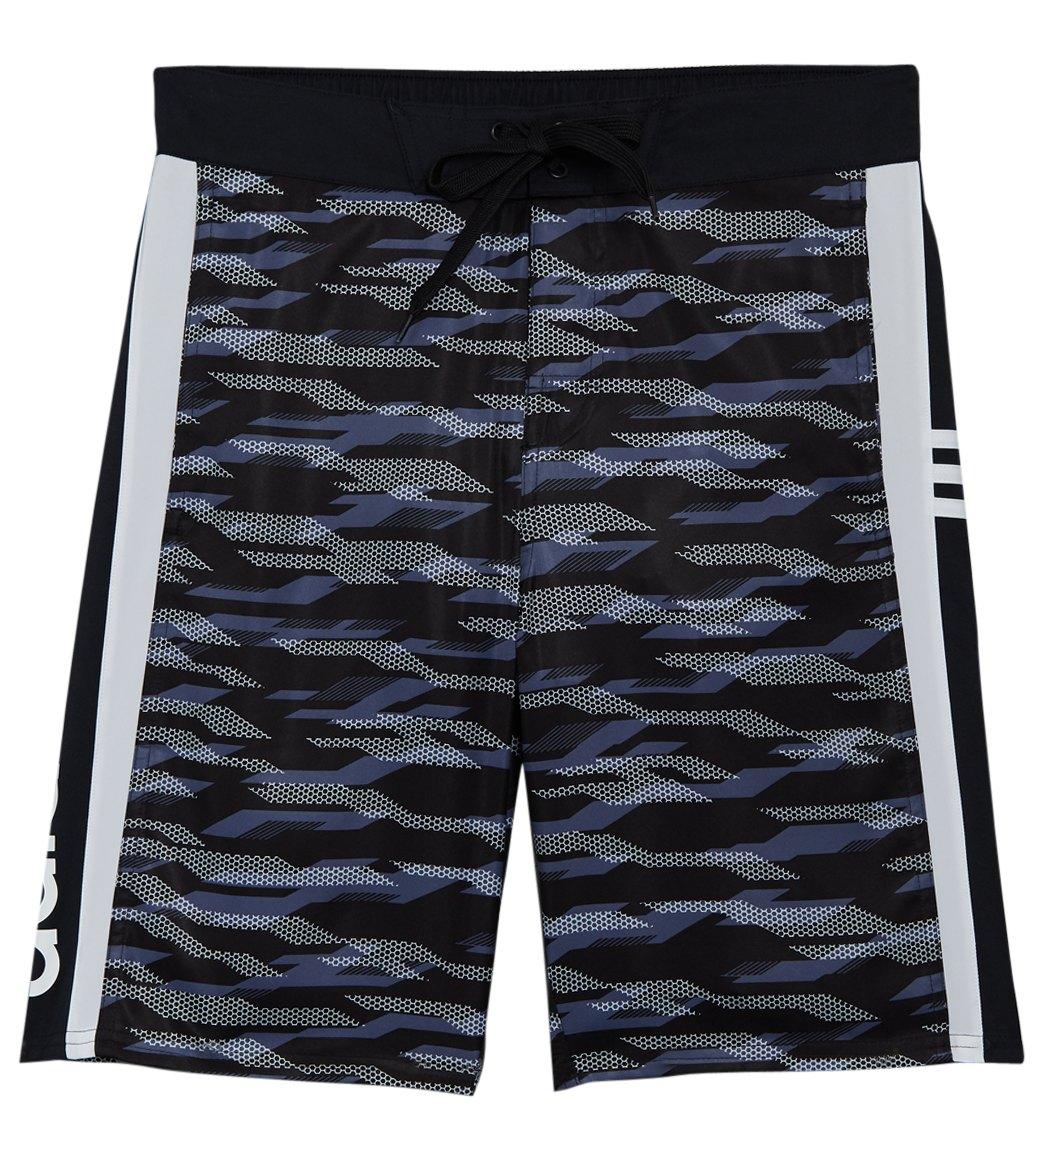 e shorts adidas